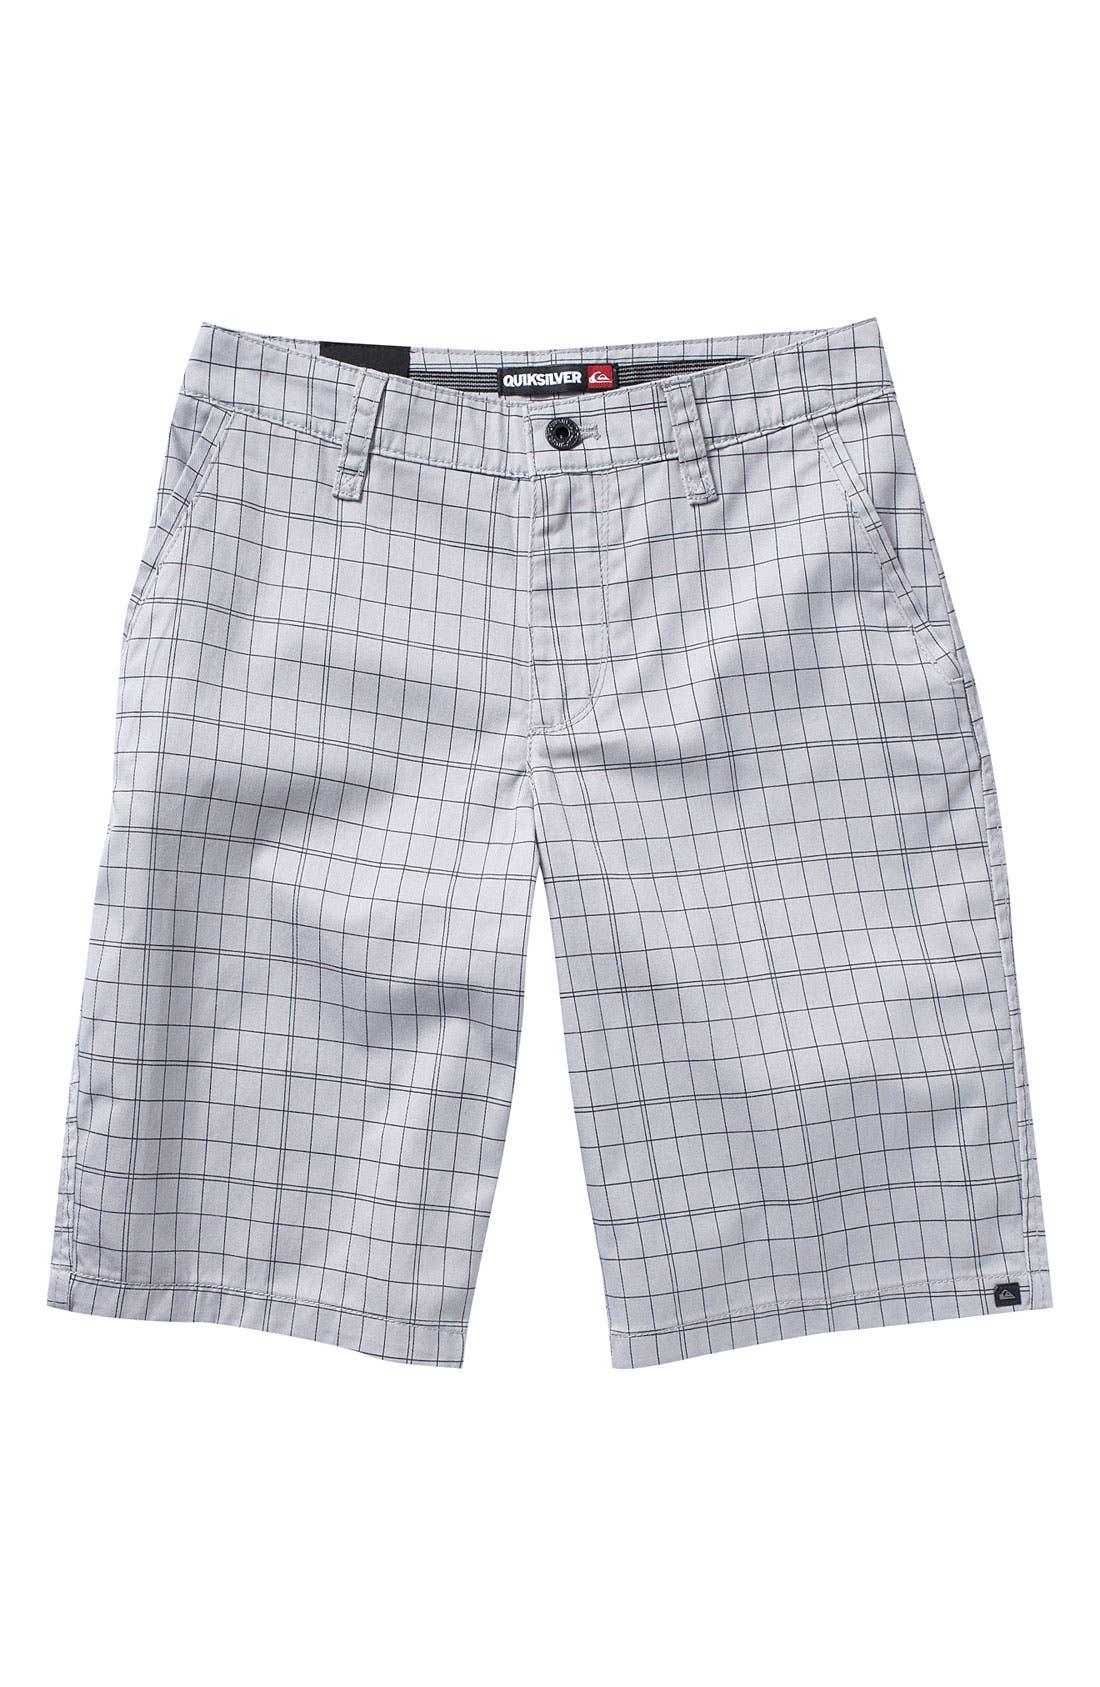 Main Image - Quiksilver 'Nuno' Shorts (Little Boys)